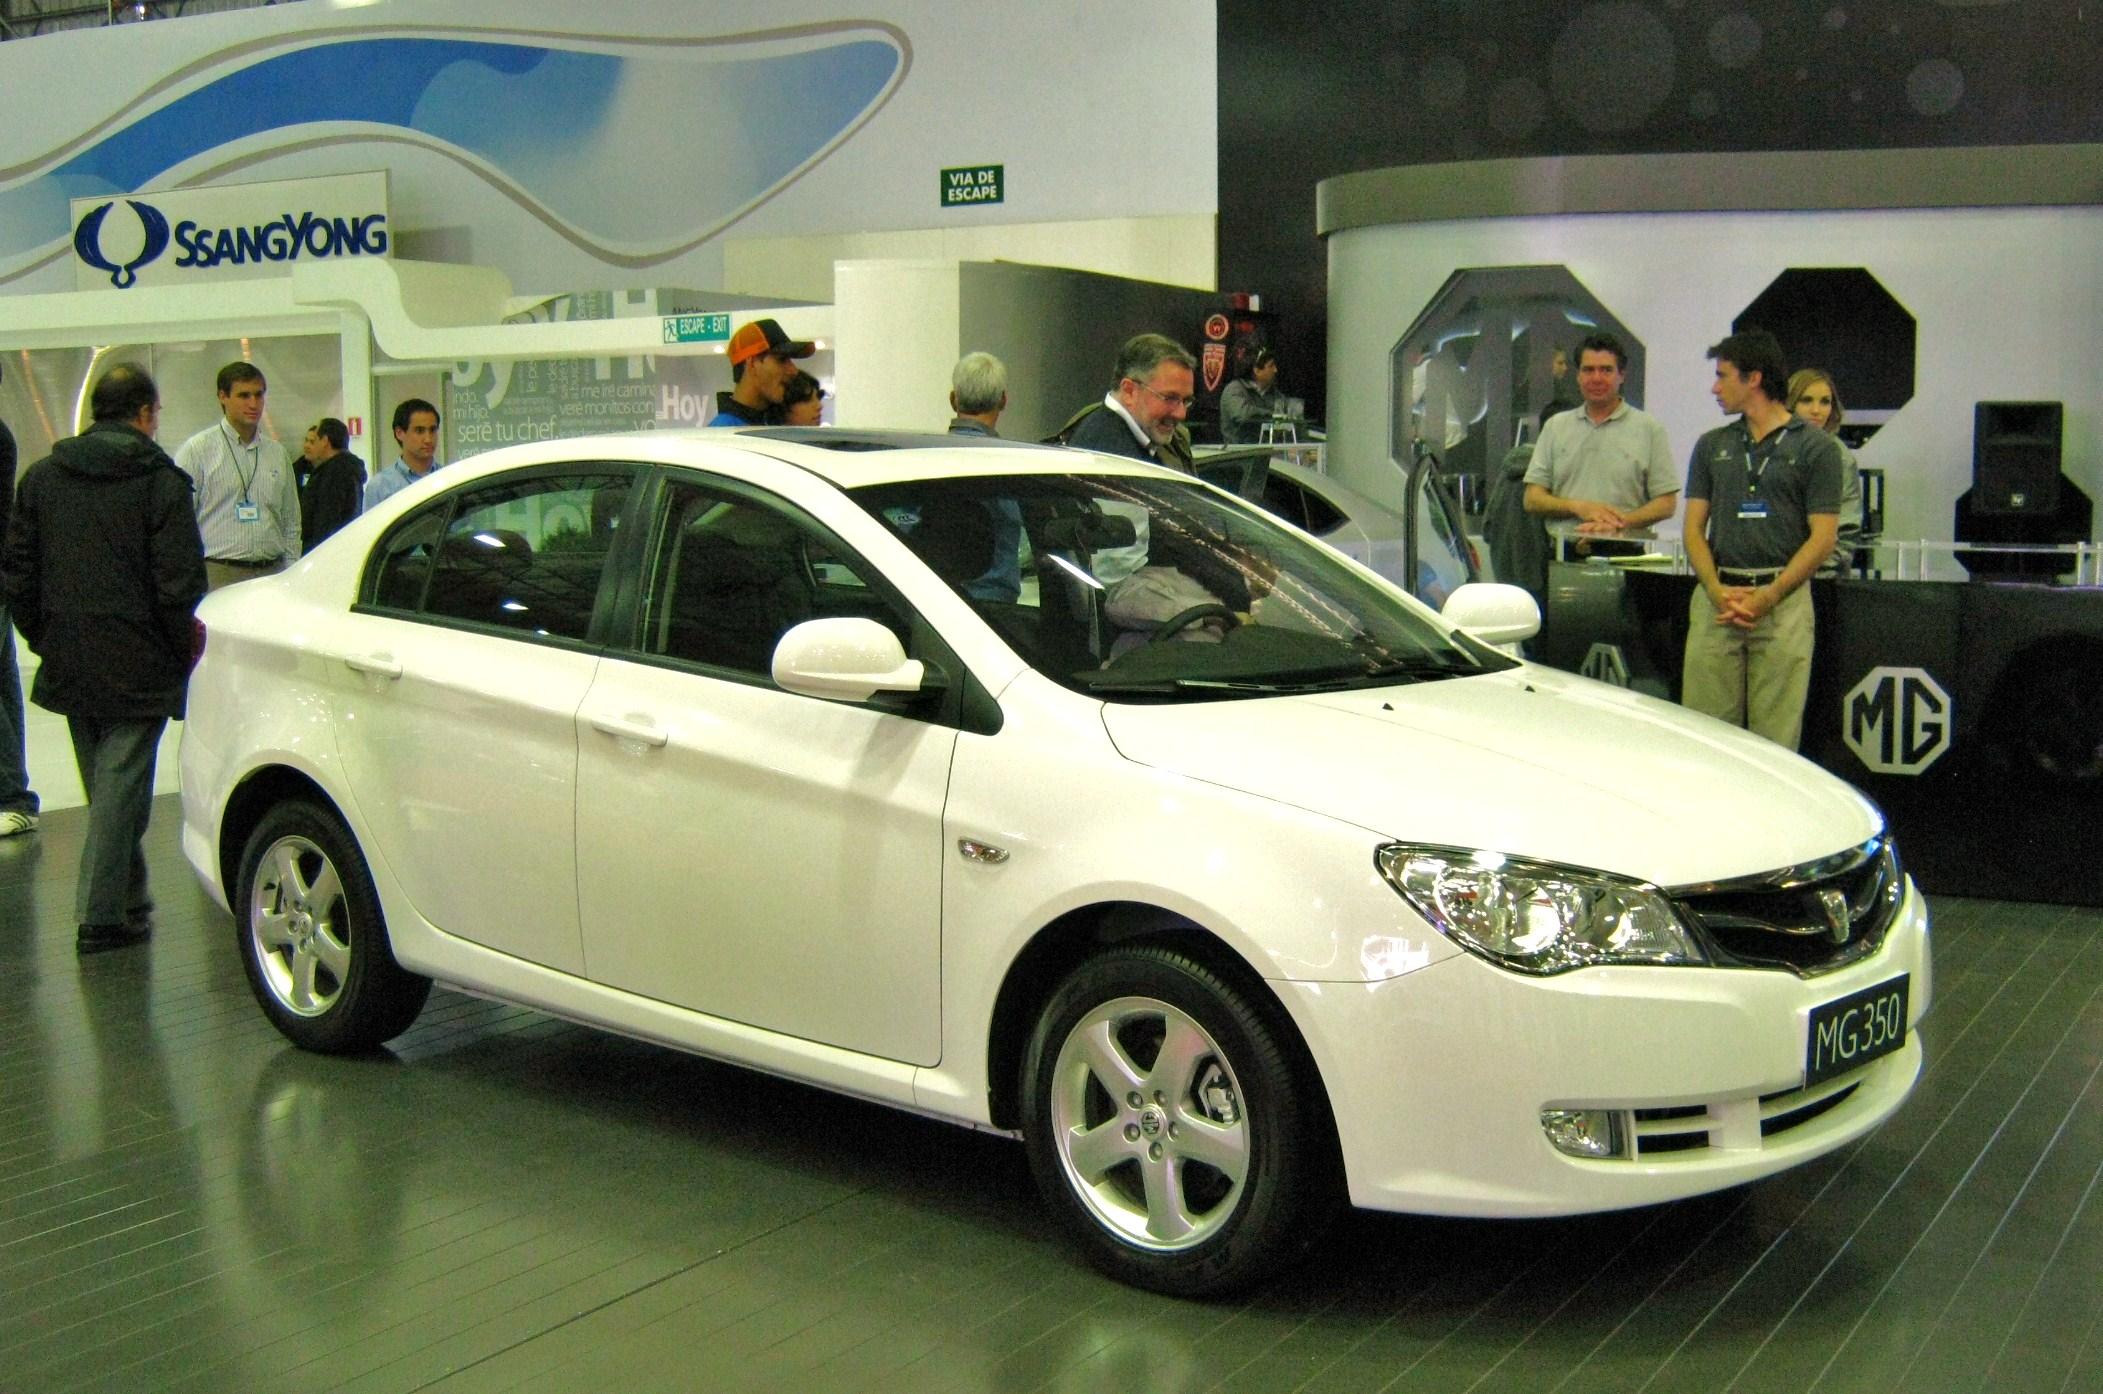 File:MG 350 (car).JPG - Wikimedia Commons